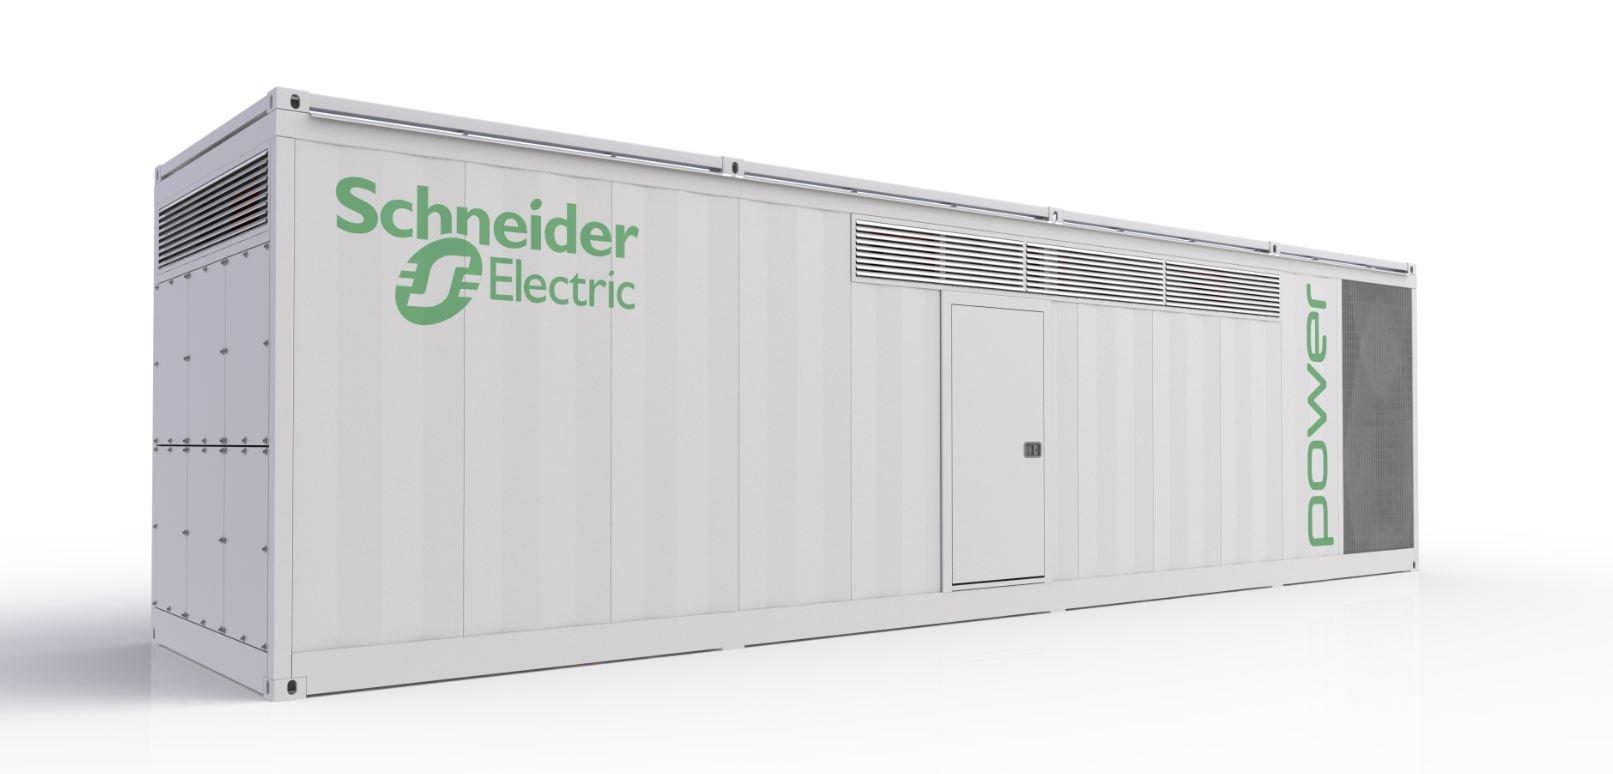 Baidu Buys Modular Data Center From Schneider Dcd